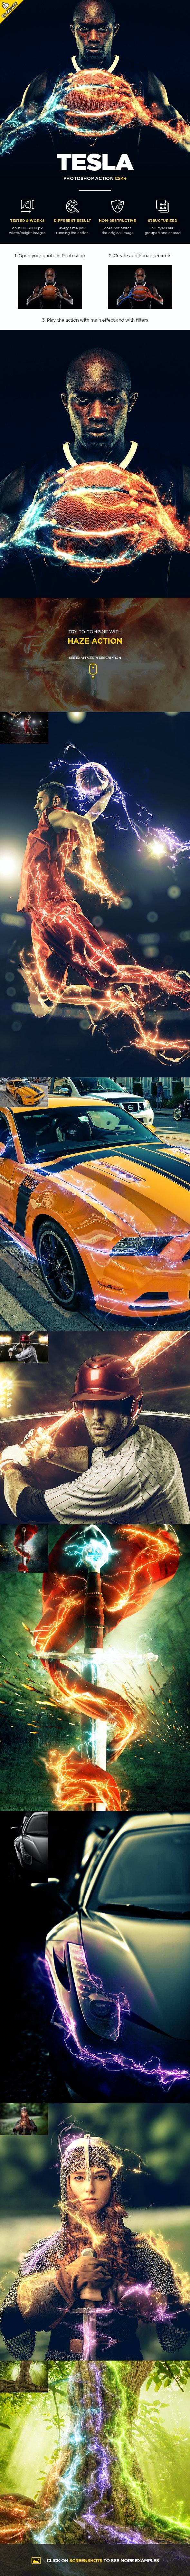 Tesla CS3+ Photoshop Action - Photo Effects Actions